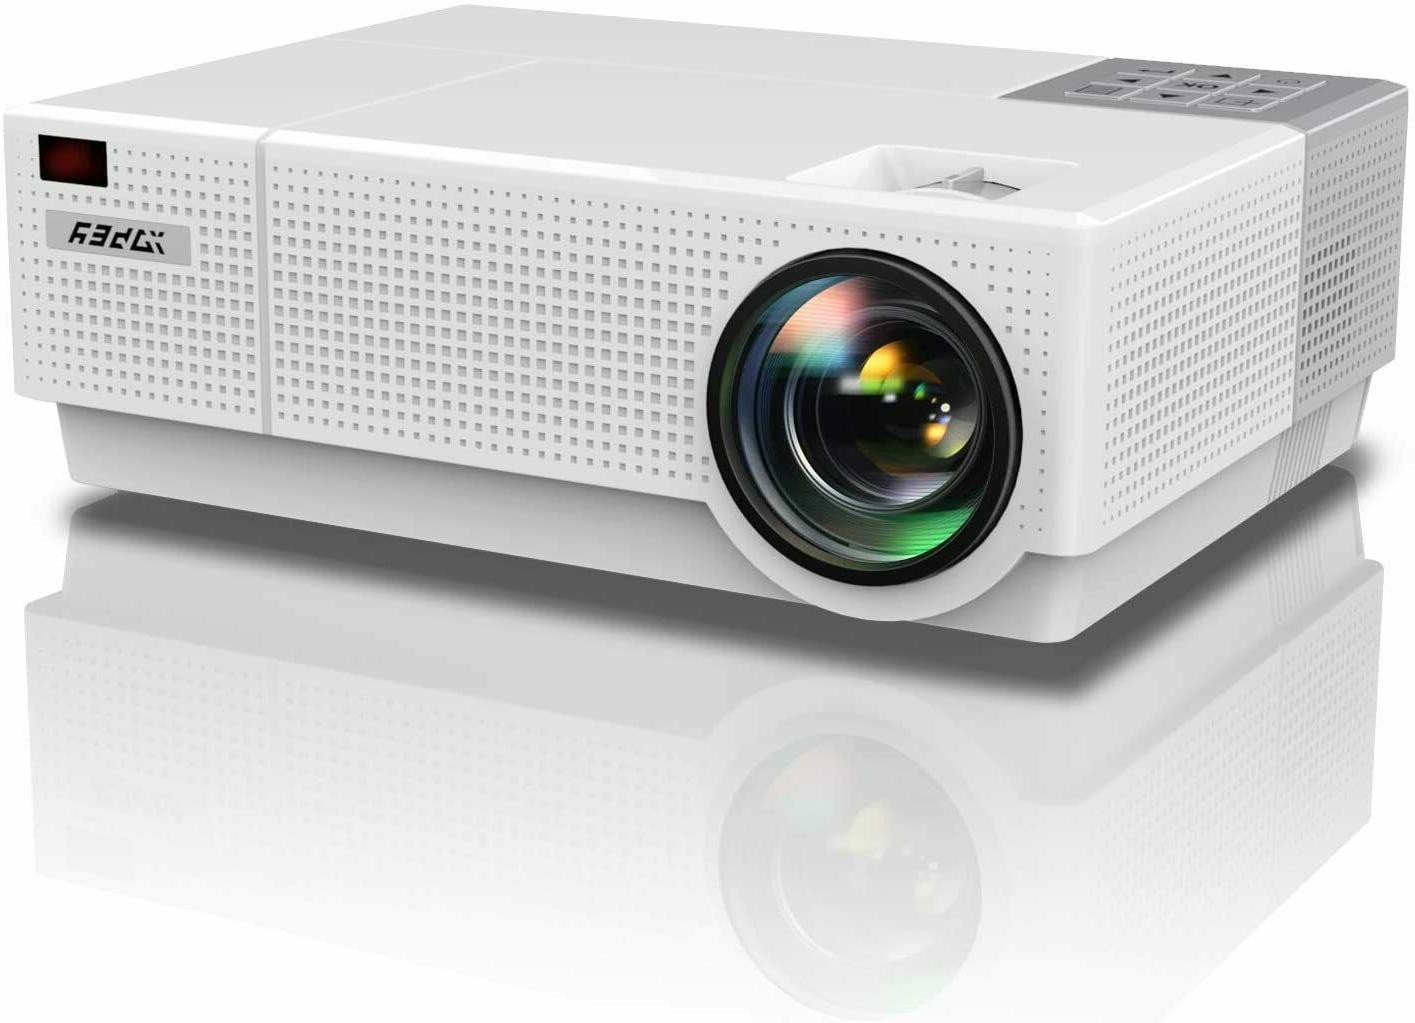 native 1080p projector hd video projector 5800